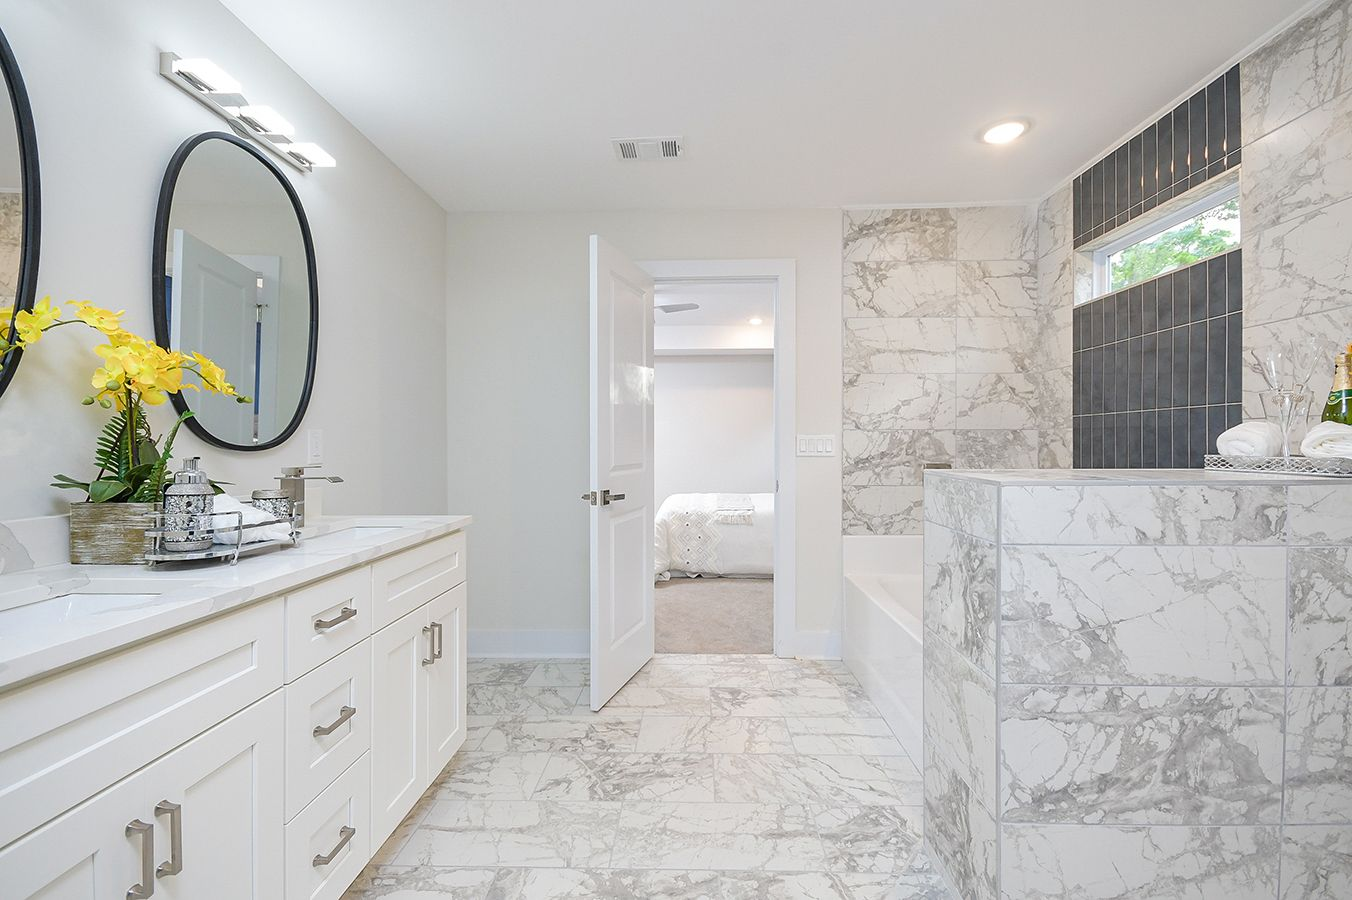 Upper_Level_Master_Bathroom_view4.jpg